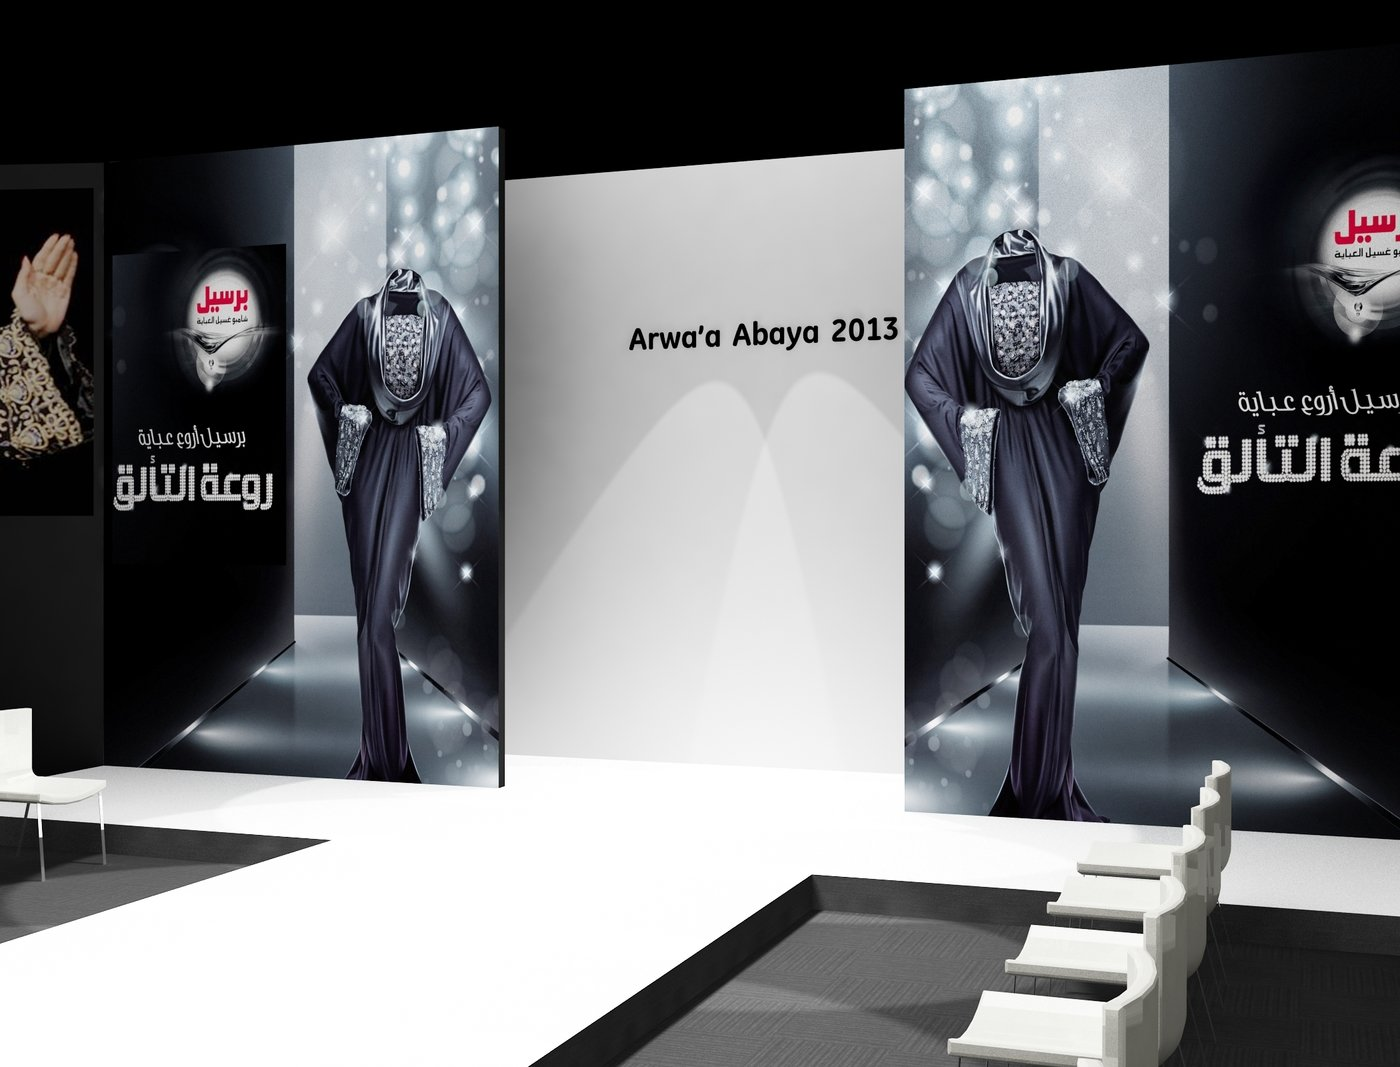 Arwa Abaya Fashion Show Setup 2013 Dubai By Chanchal Sharma At Coroflot Com